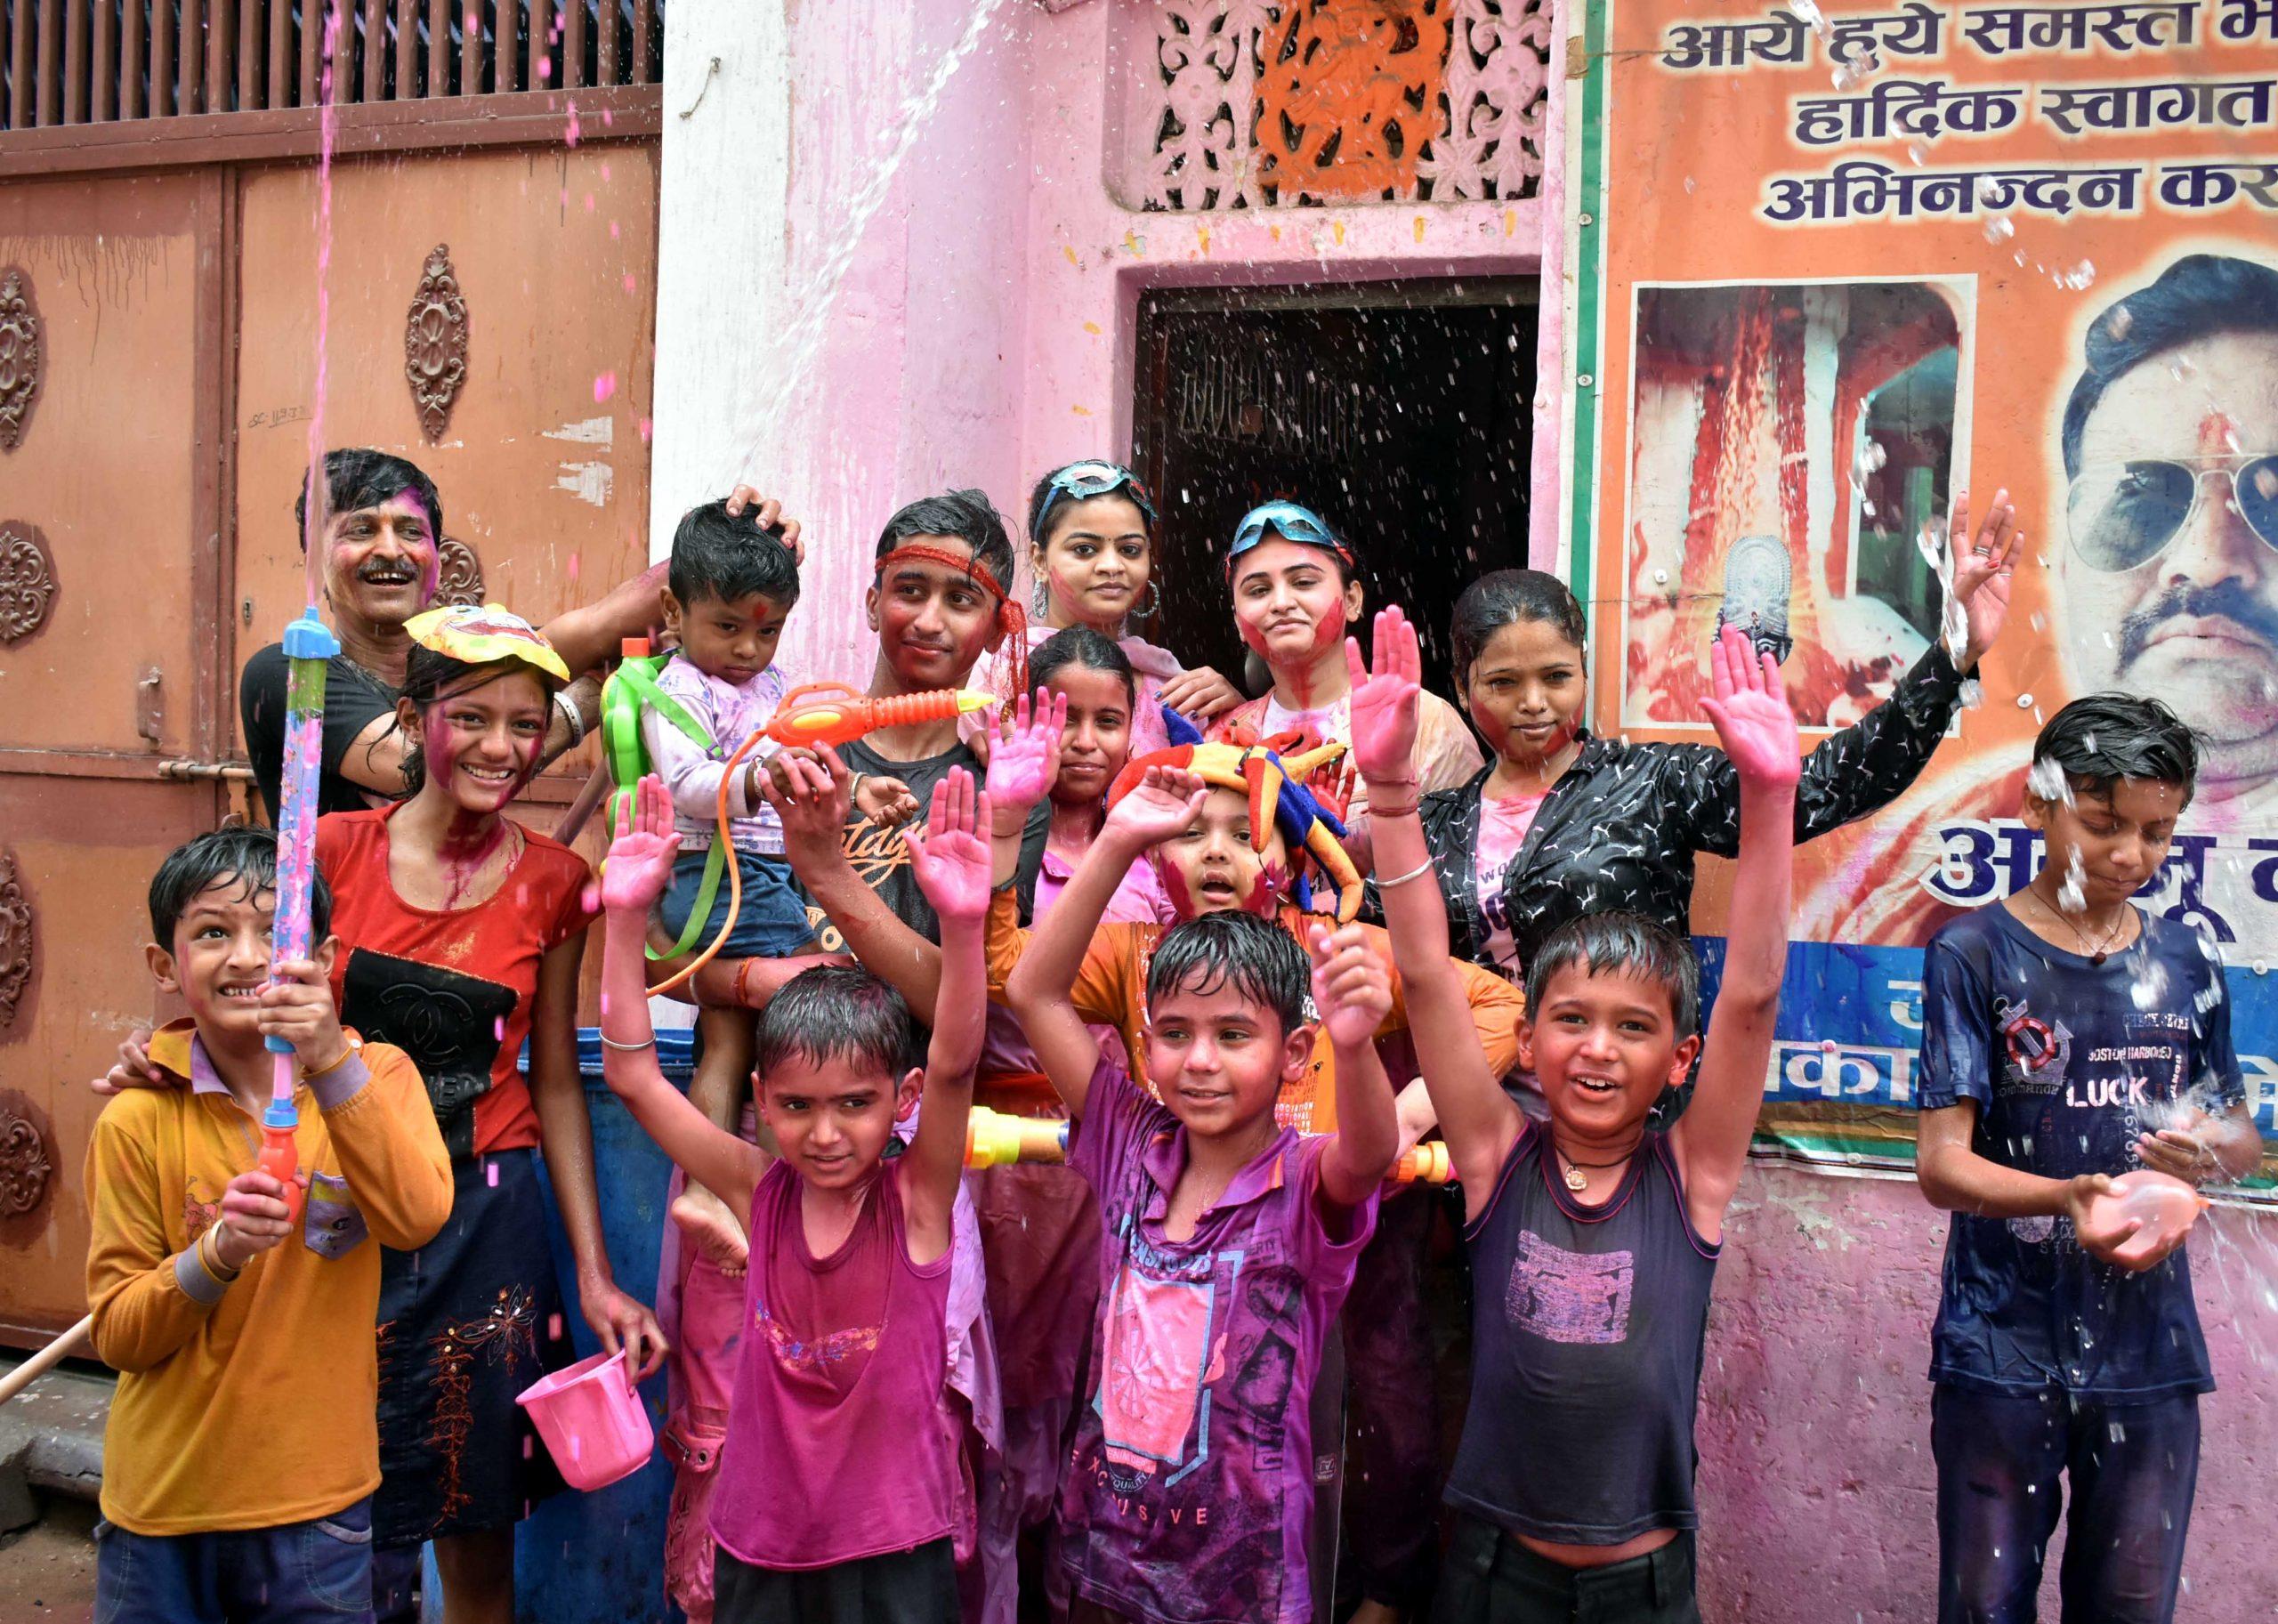 Children celebrating holi festival